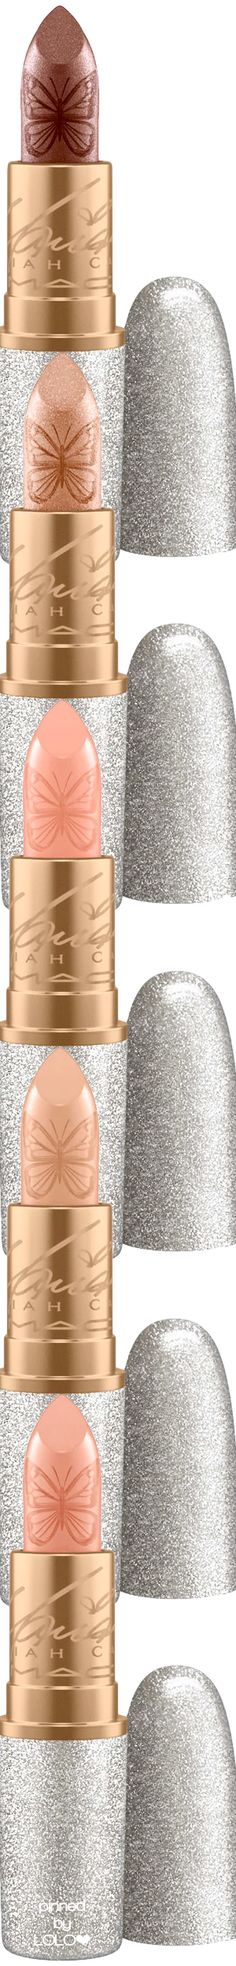 M·A·C Mariah Carey Collection Assorted Lipsticks (sold separately) | LOLO❤︎ Mac Makeup Set, Clinique Makeup, Makeup Cosmetics, Max Makeup, Beauty Corner, Gris Rose, Perfume, Glossy Lips, Cute Makeup